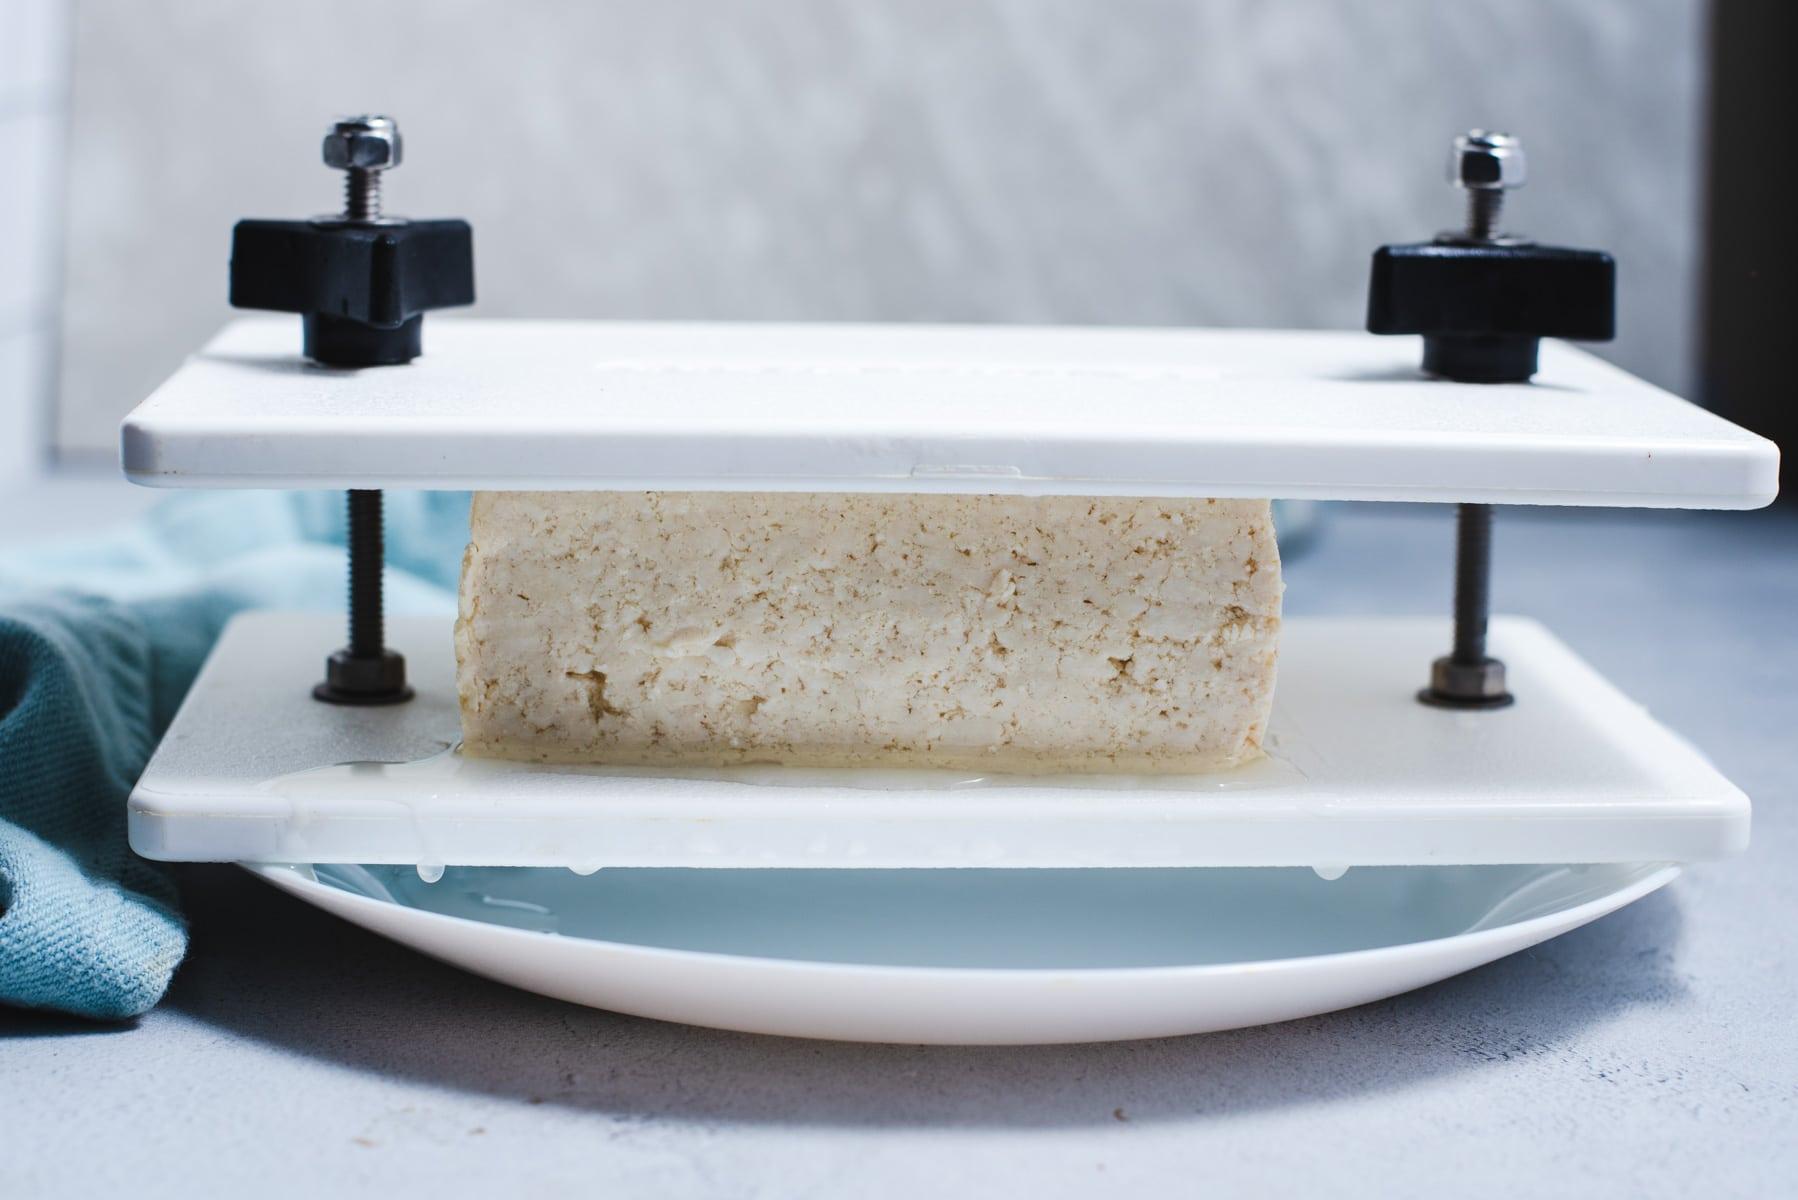 Tofu being pressed in white tofu press